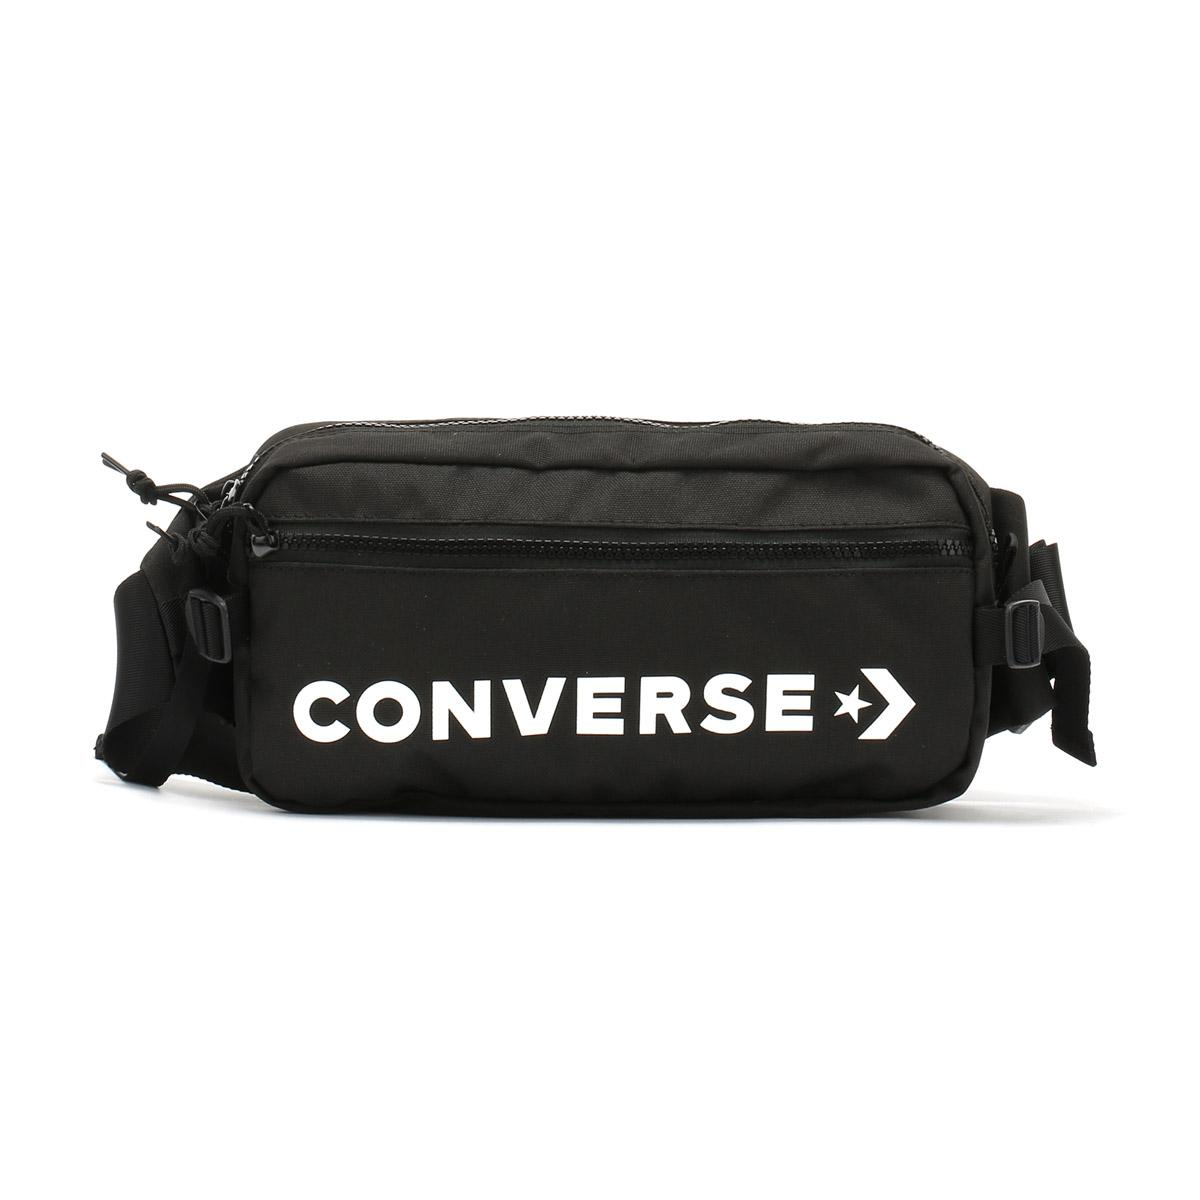 e7fc46e07aee Lyst - Converse Black   White Fast Pack Sling Bag in Black for Men